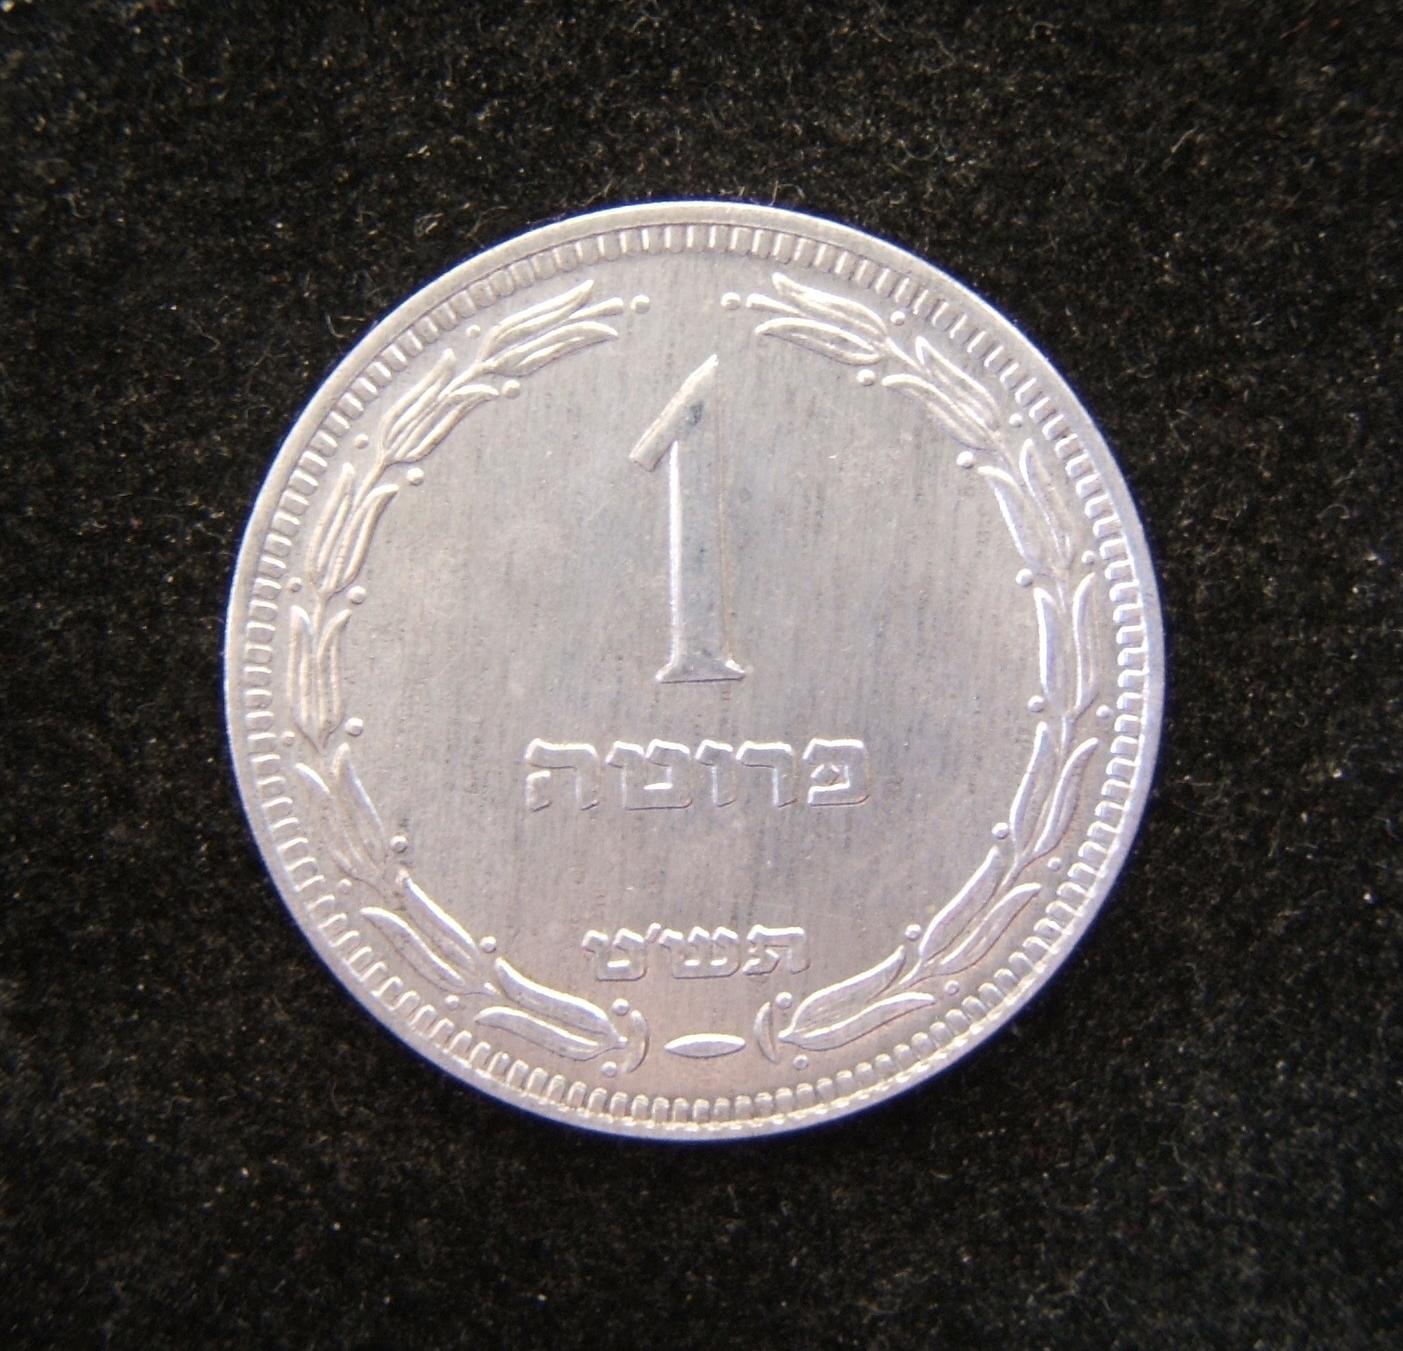 Lot 25 - Coins: Israeli  -  Historama HISTORAMA AUCTION #7 - 'Buy or Bid' Sale